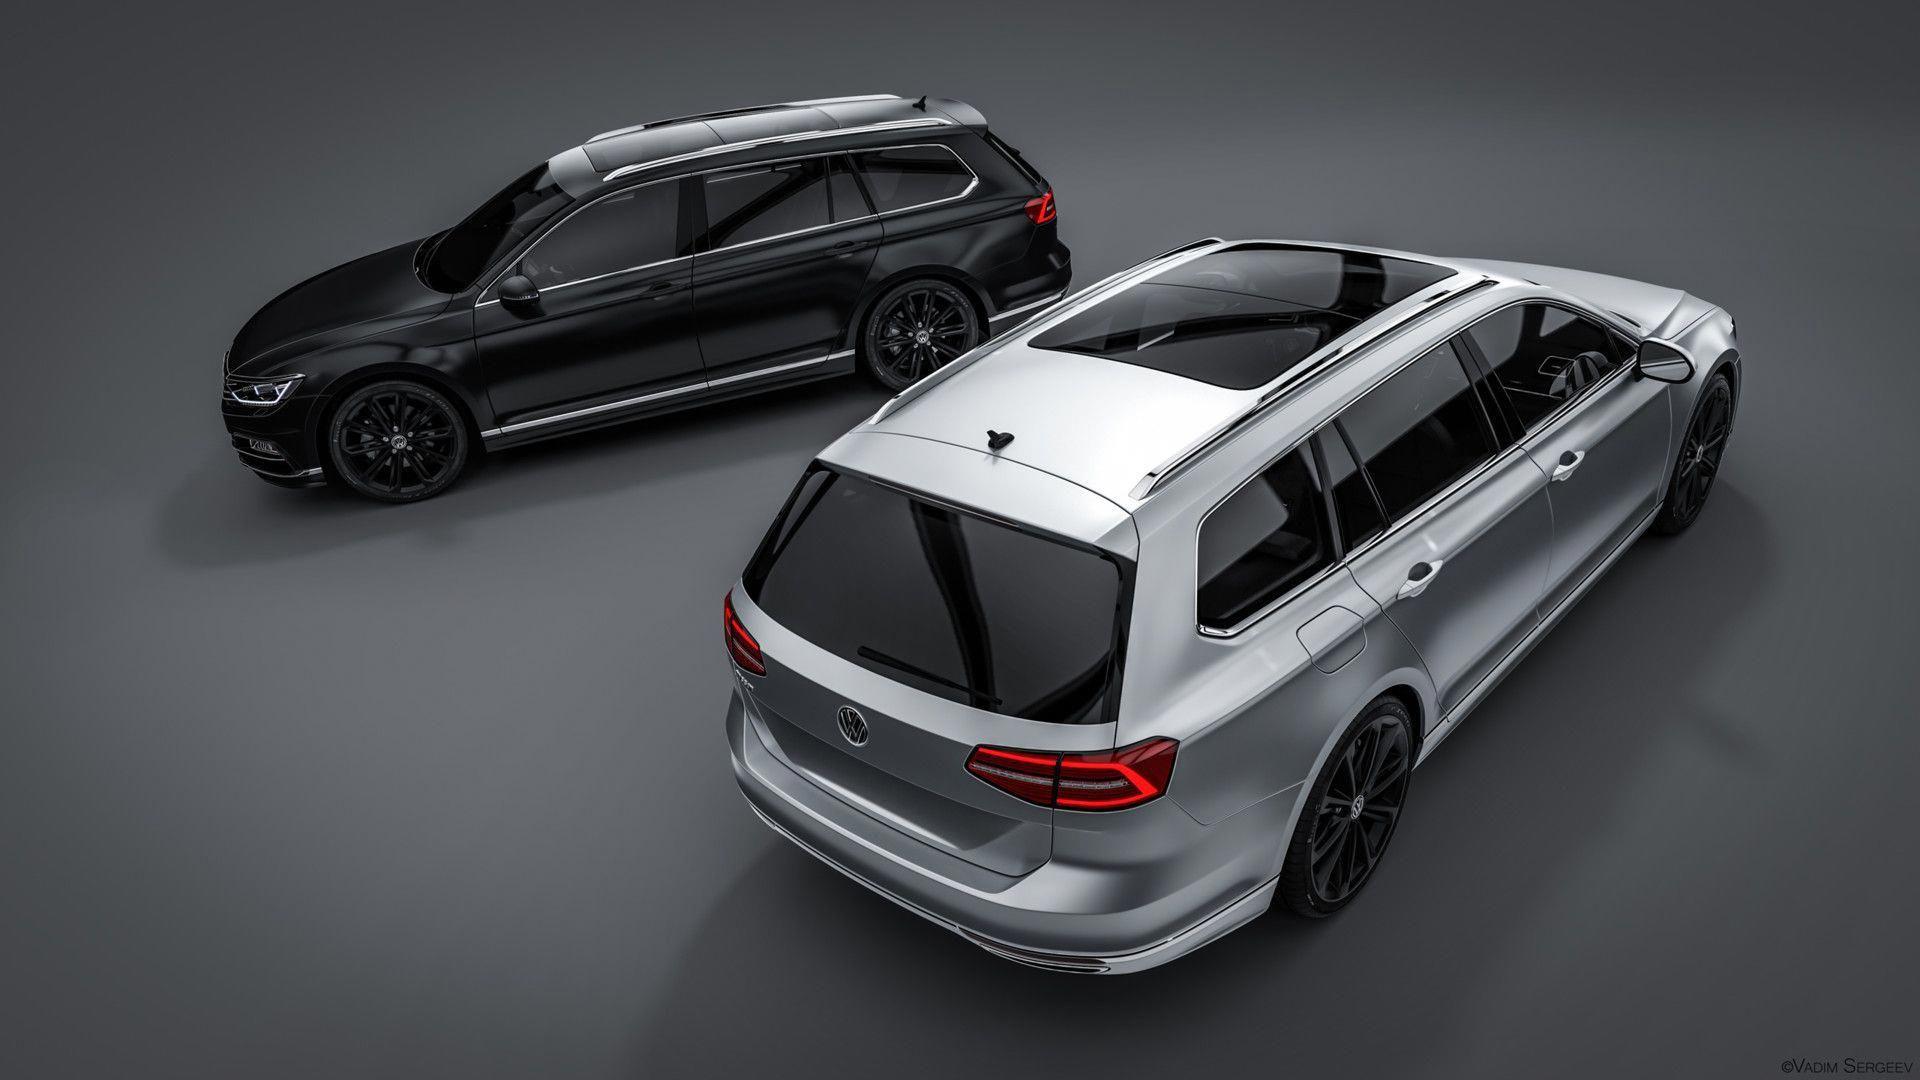 Artstation Volkswagen Passat Variant R Line 2015 Vadim Sergeev Volkswagenpassatcustom Volkswagen Volkswagen Passat Vw Passat